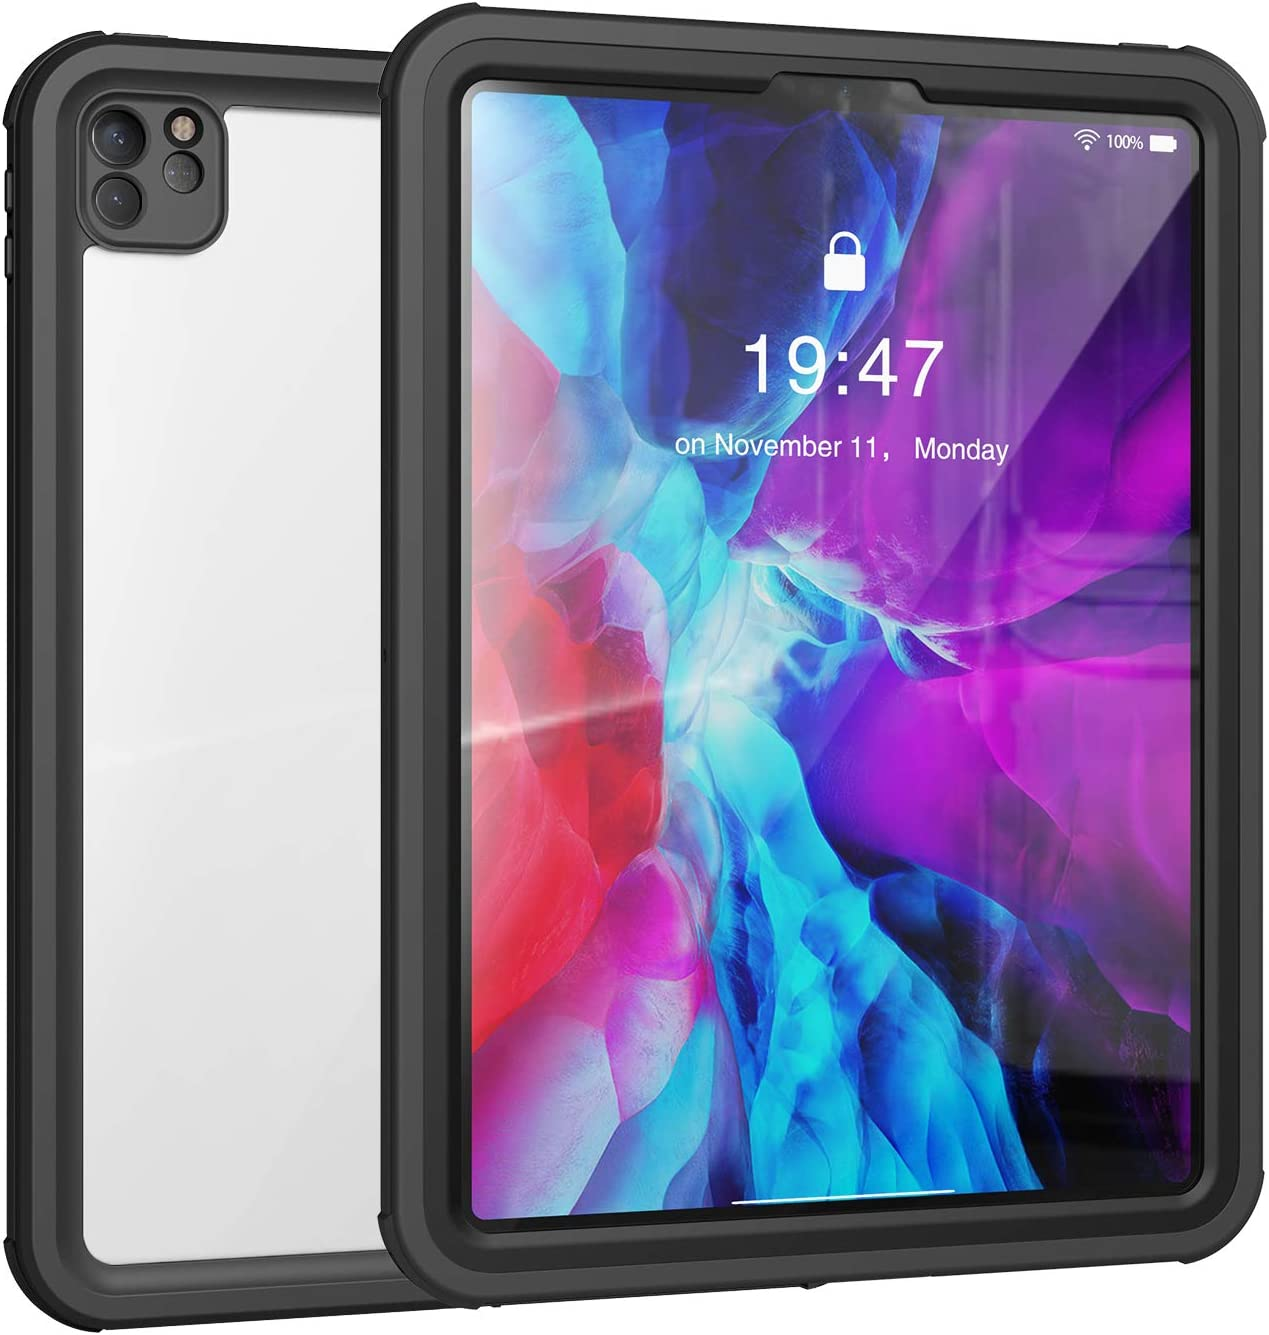 iPad Pro 11 Waterproof Case(2nd Generation) 2020,Waterproof Protective Case with Built-in Screen Protector Shock-Absorbing Bumper Dustproof Submersible Full-Body Case